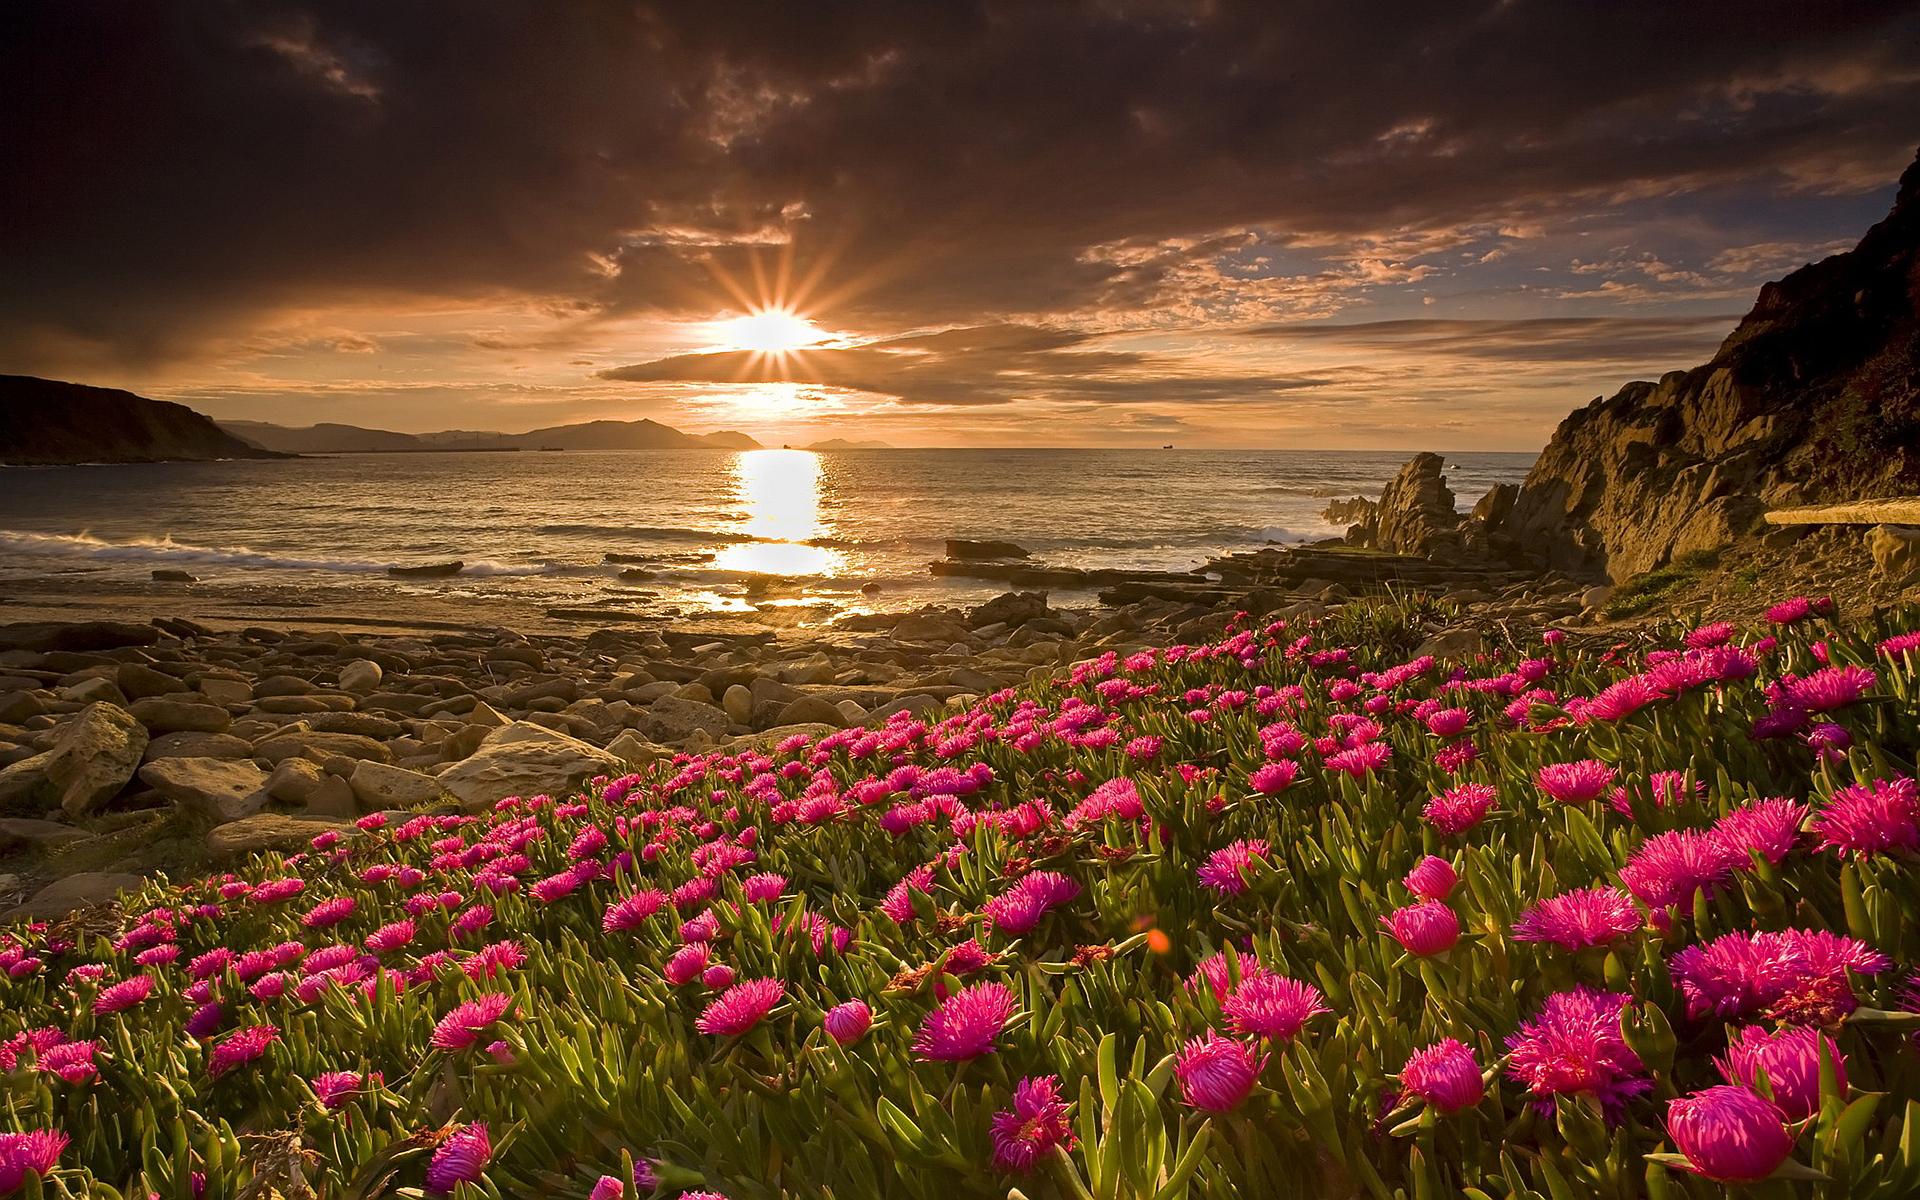 Beach flowers sunset